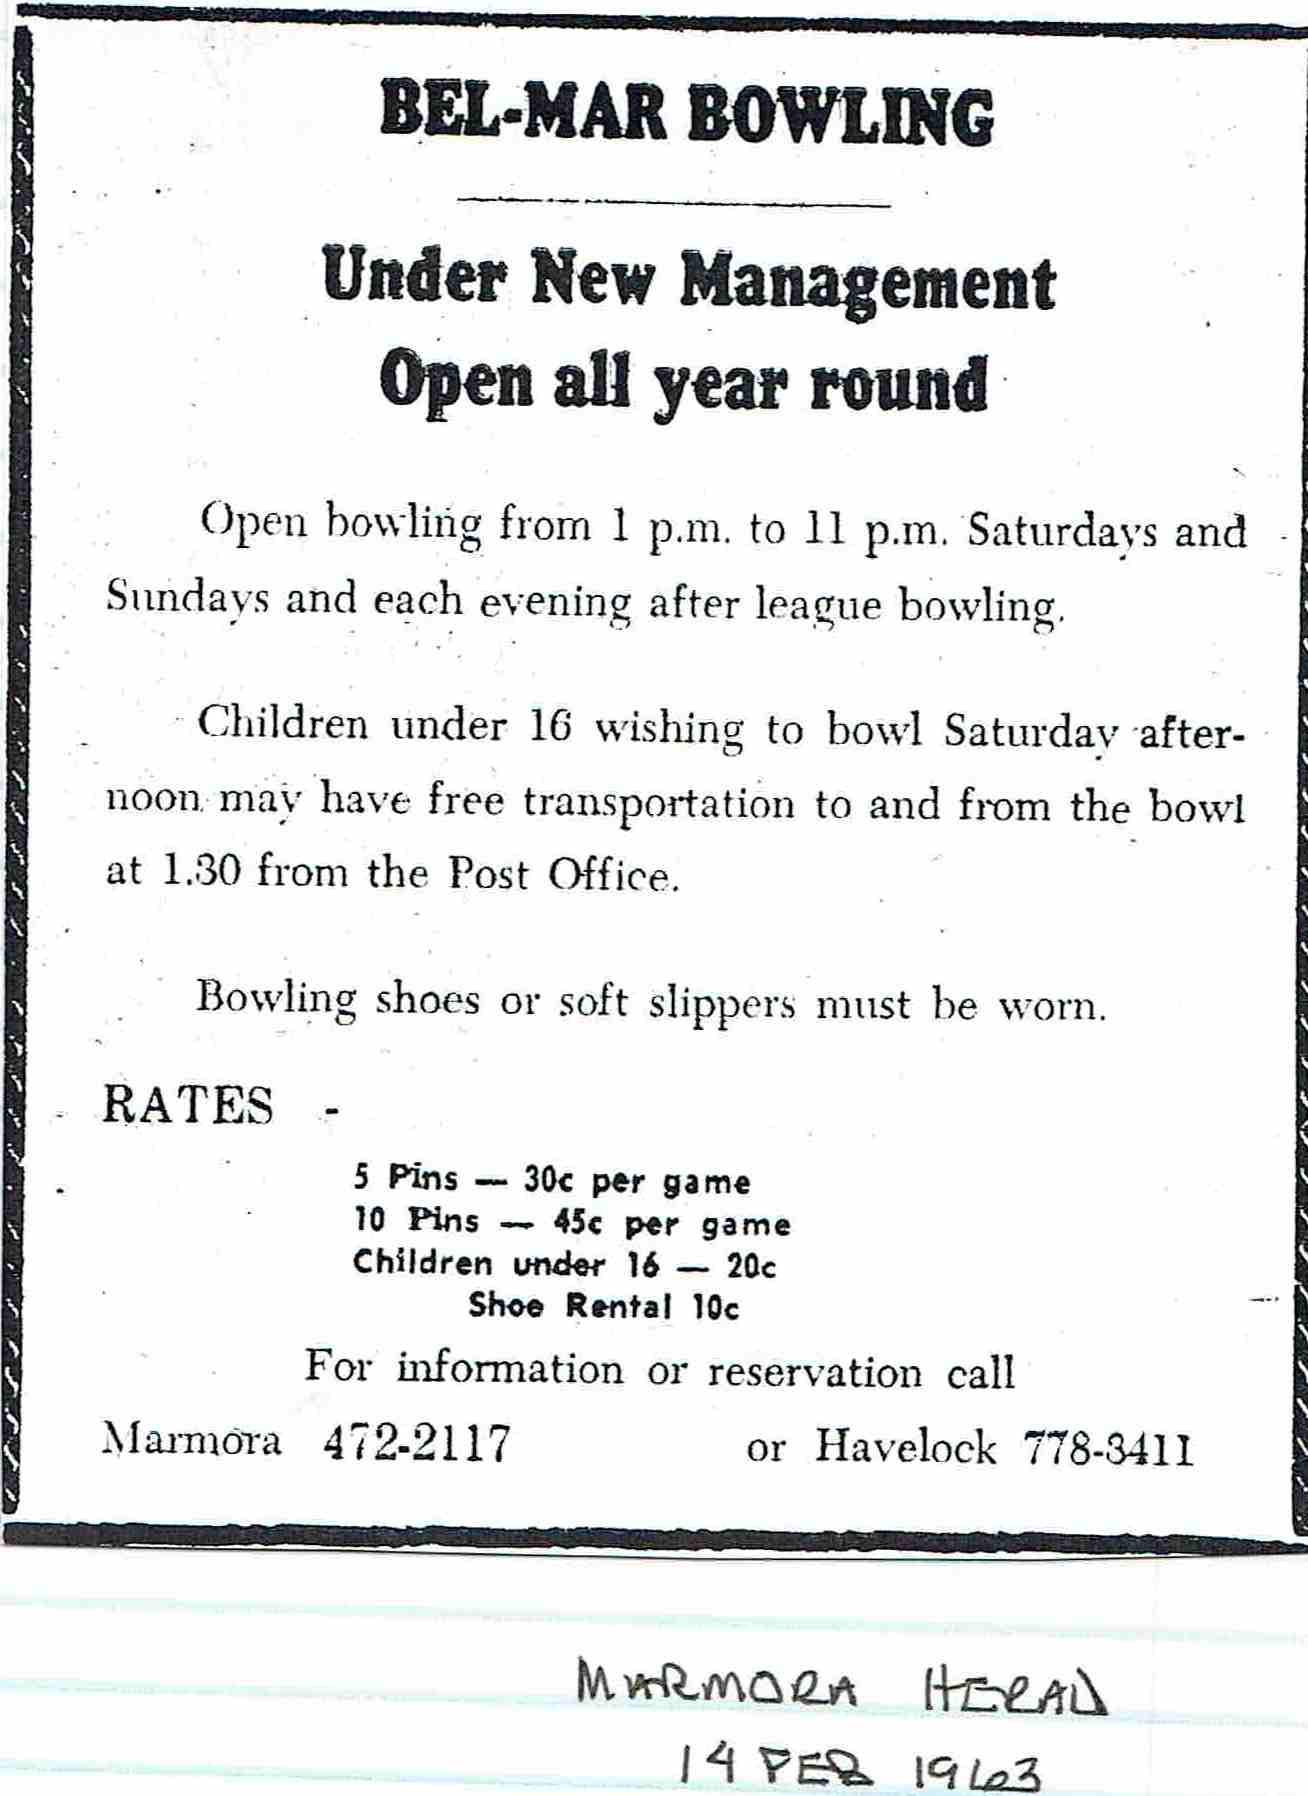 1968 Bel-Mar Bowling.JPG